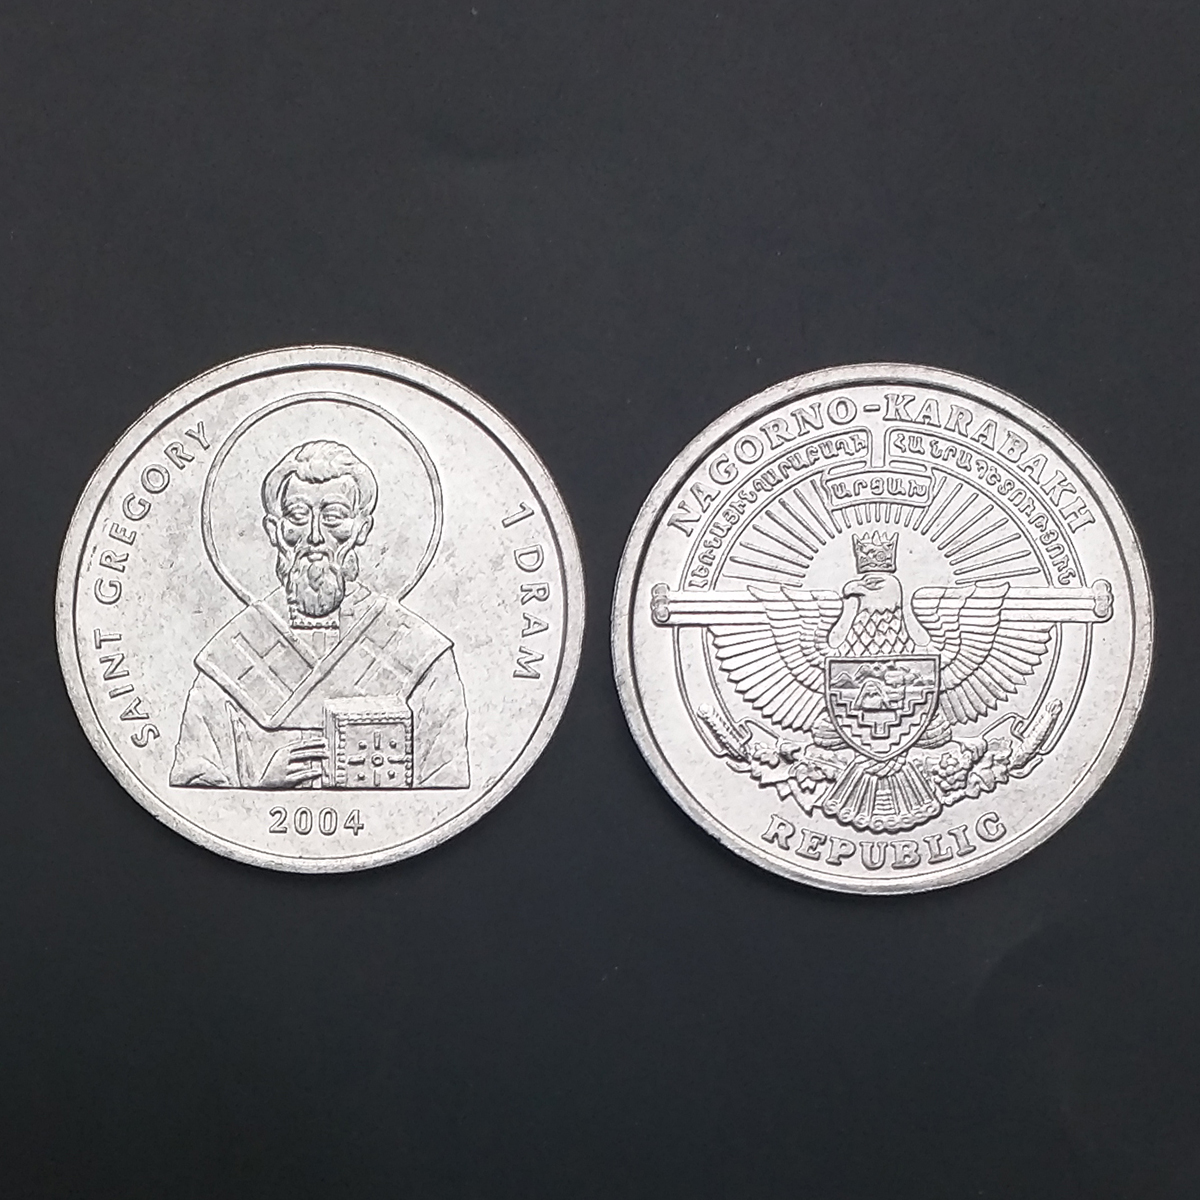 Nagorno Karabakh (Naka) 1 Dirham 2004 New Genuine Original Coins 100% Real Issuing Coins Unc